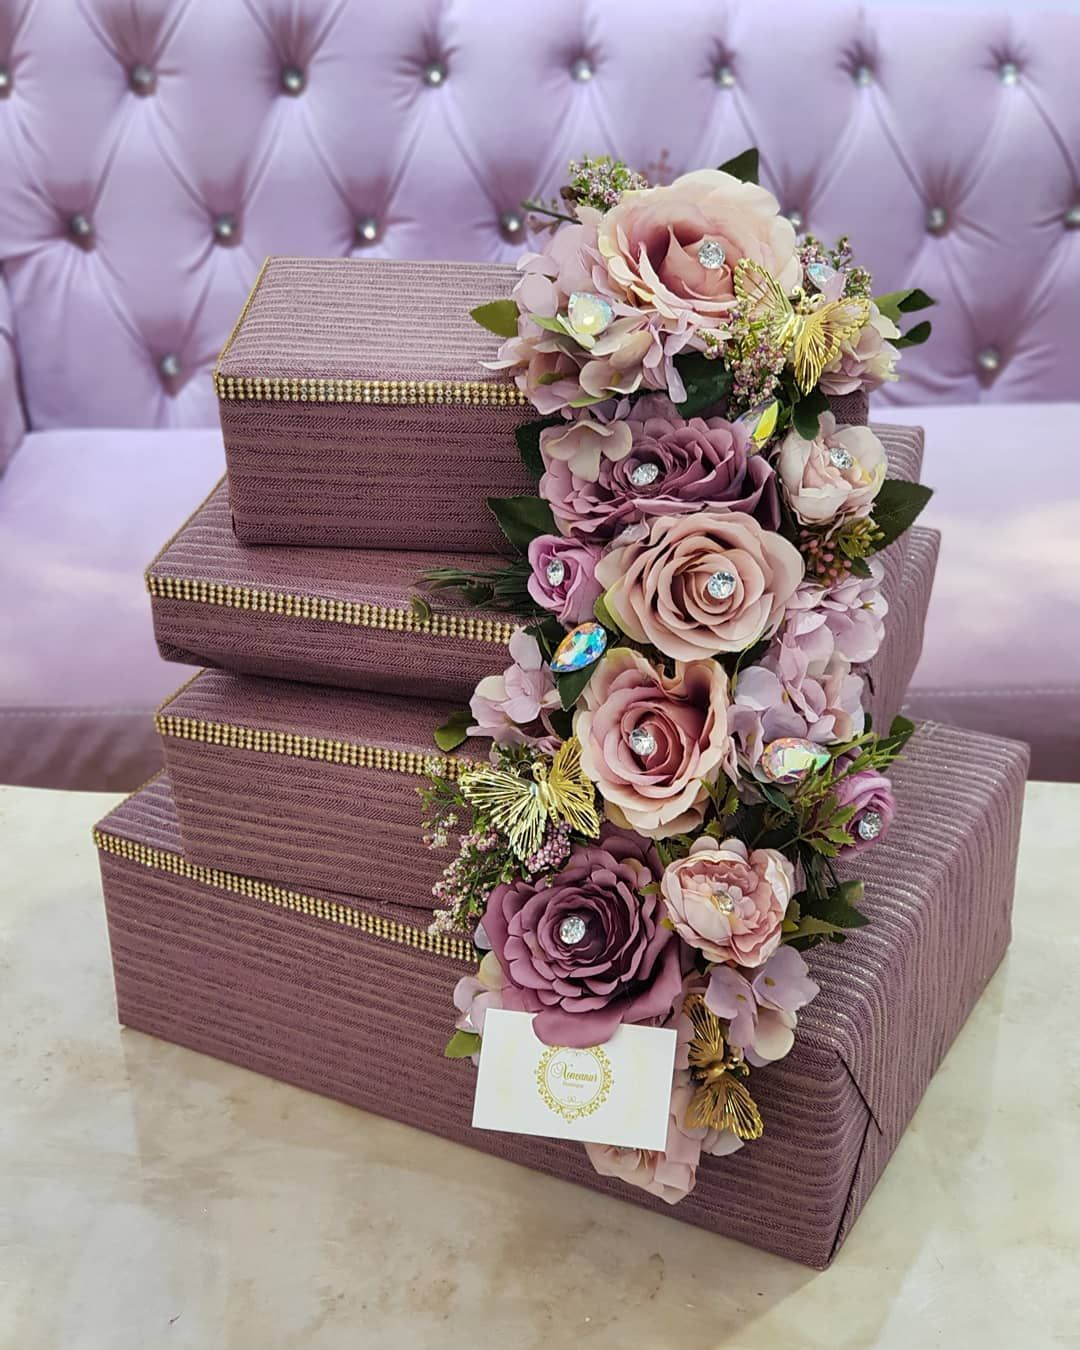 Azerbaycan Aztagram Xoncanur Hediyye Baglama Heri Nishan Xina Toy Luxury Wedding Gifts Wedding Gifts Packaging Desi Wedding Decor